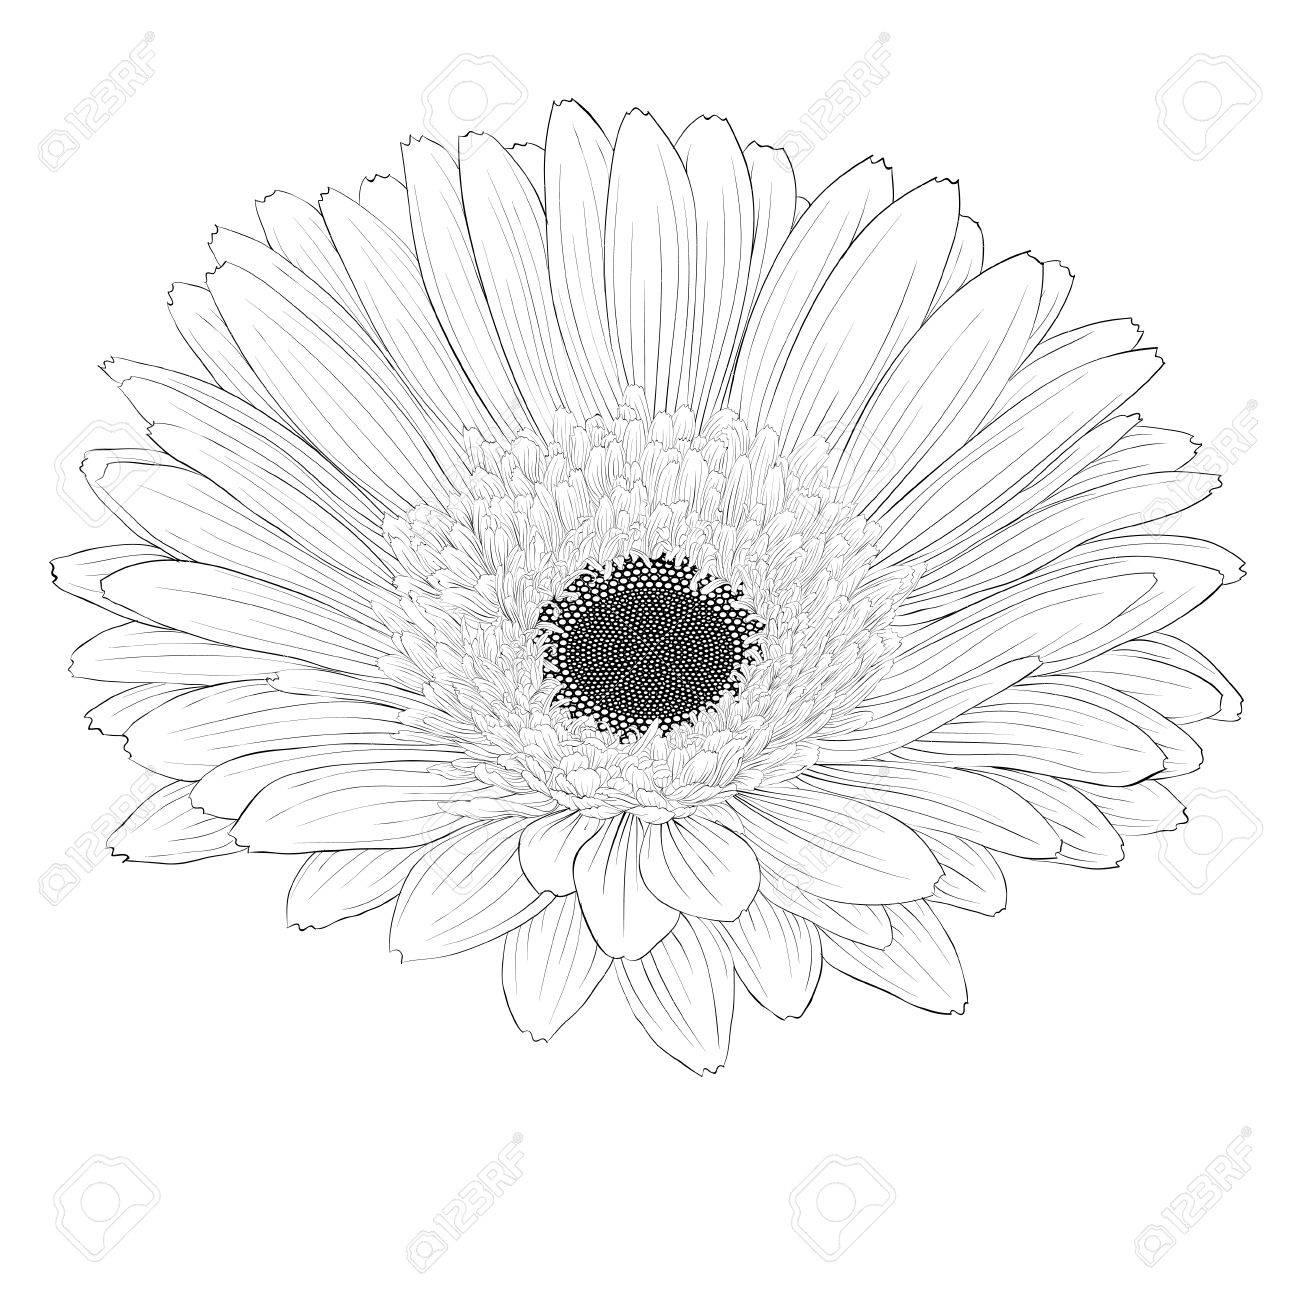 Beautiful monochrome black and white gerbera flower isolated beautiful monochrome black and white gerbera flower isolated hand drawn contour lines and mightylinksfo